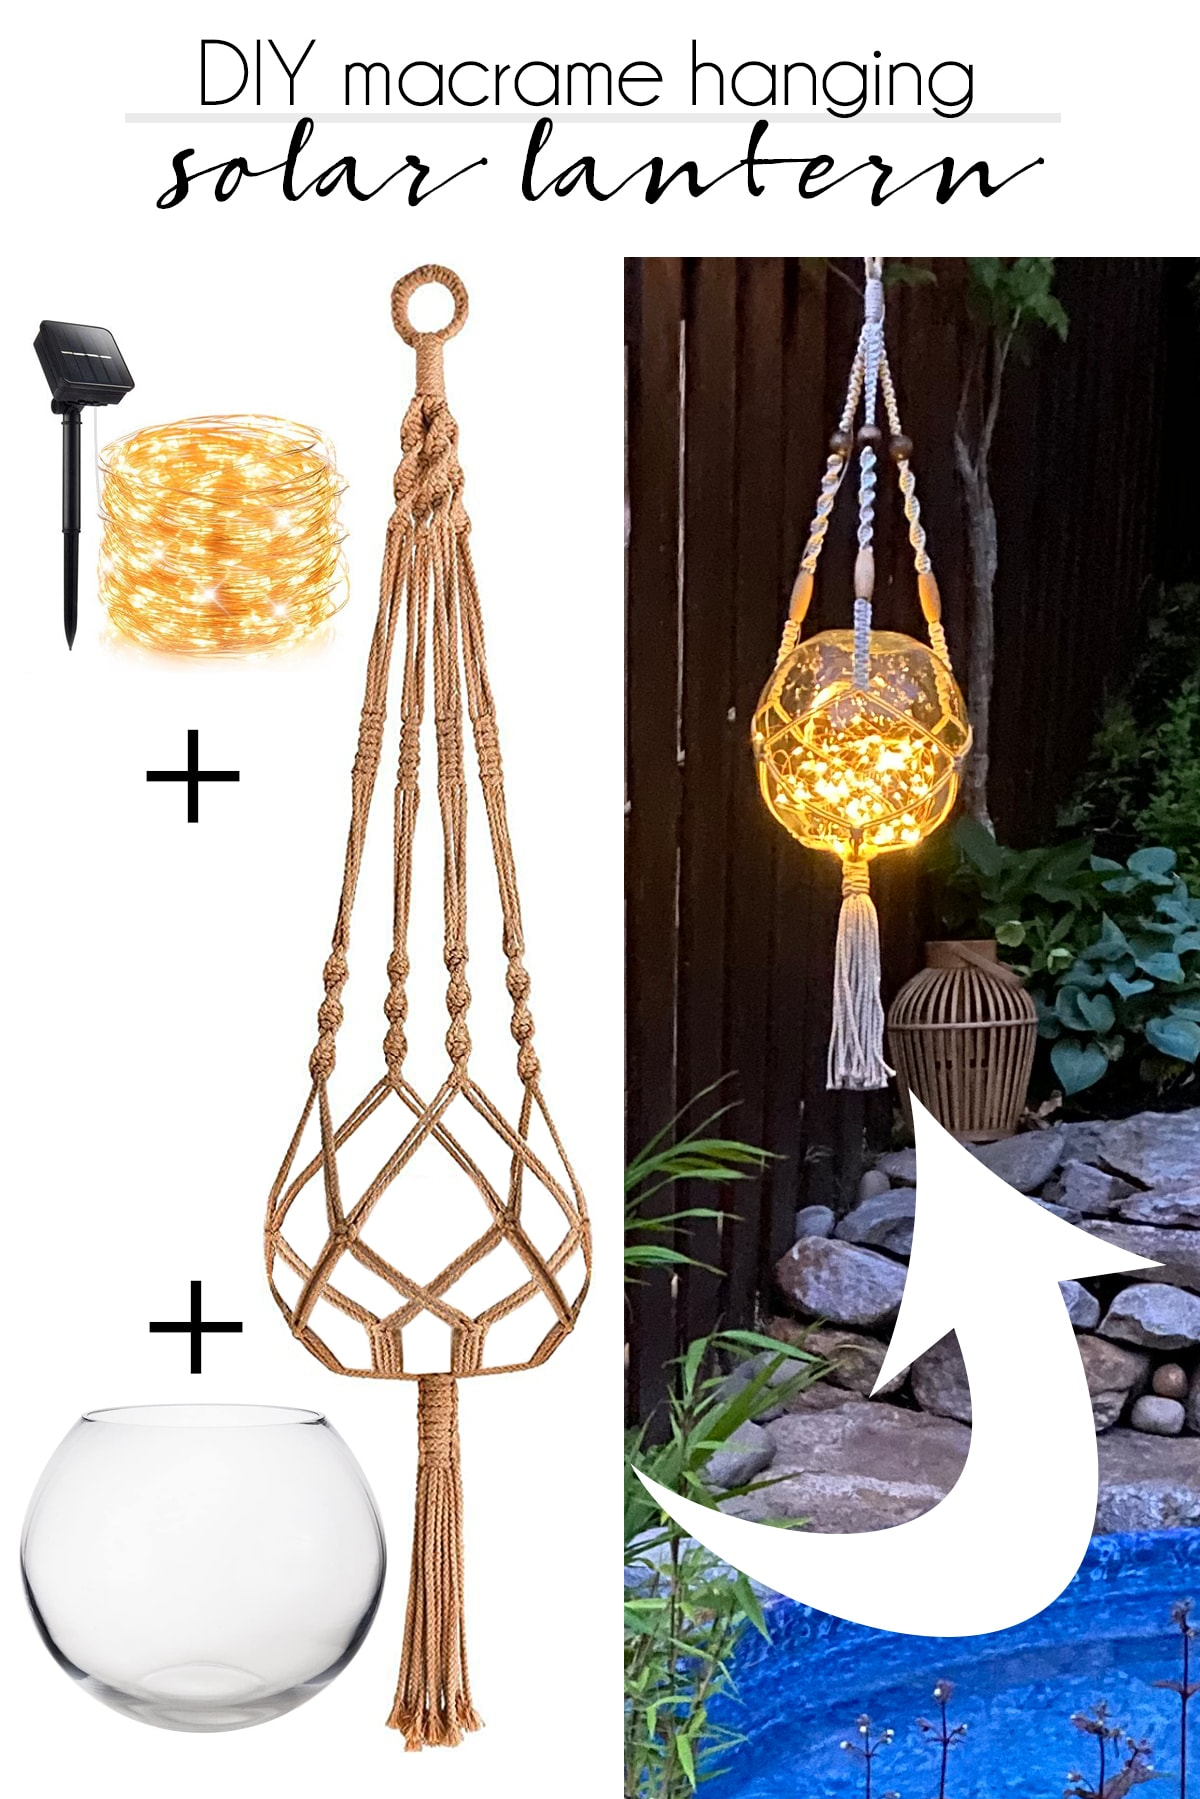 items used for DIY macrame hanging solar lantern